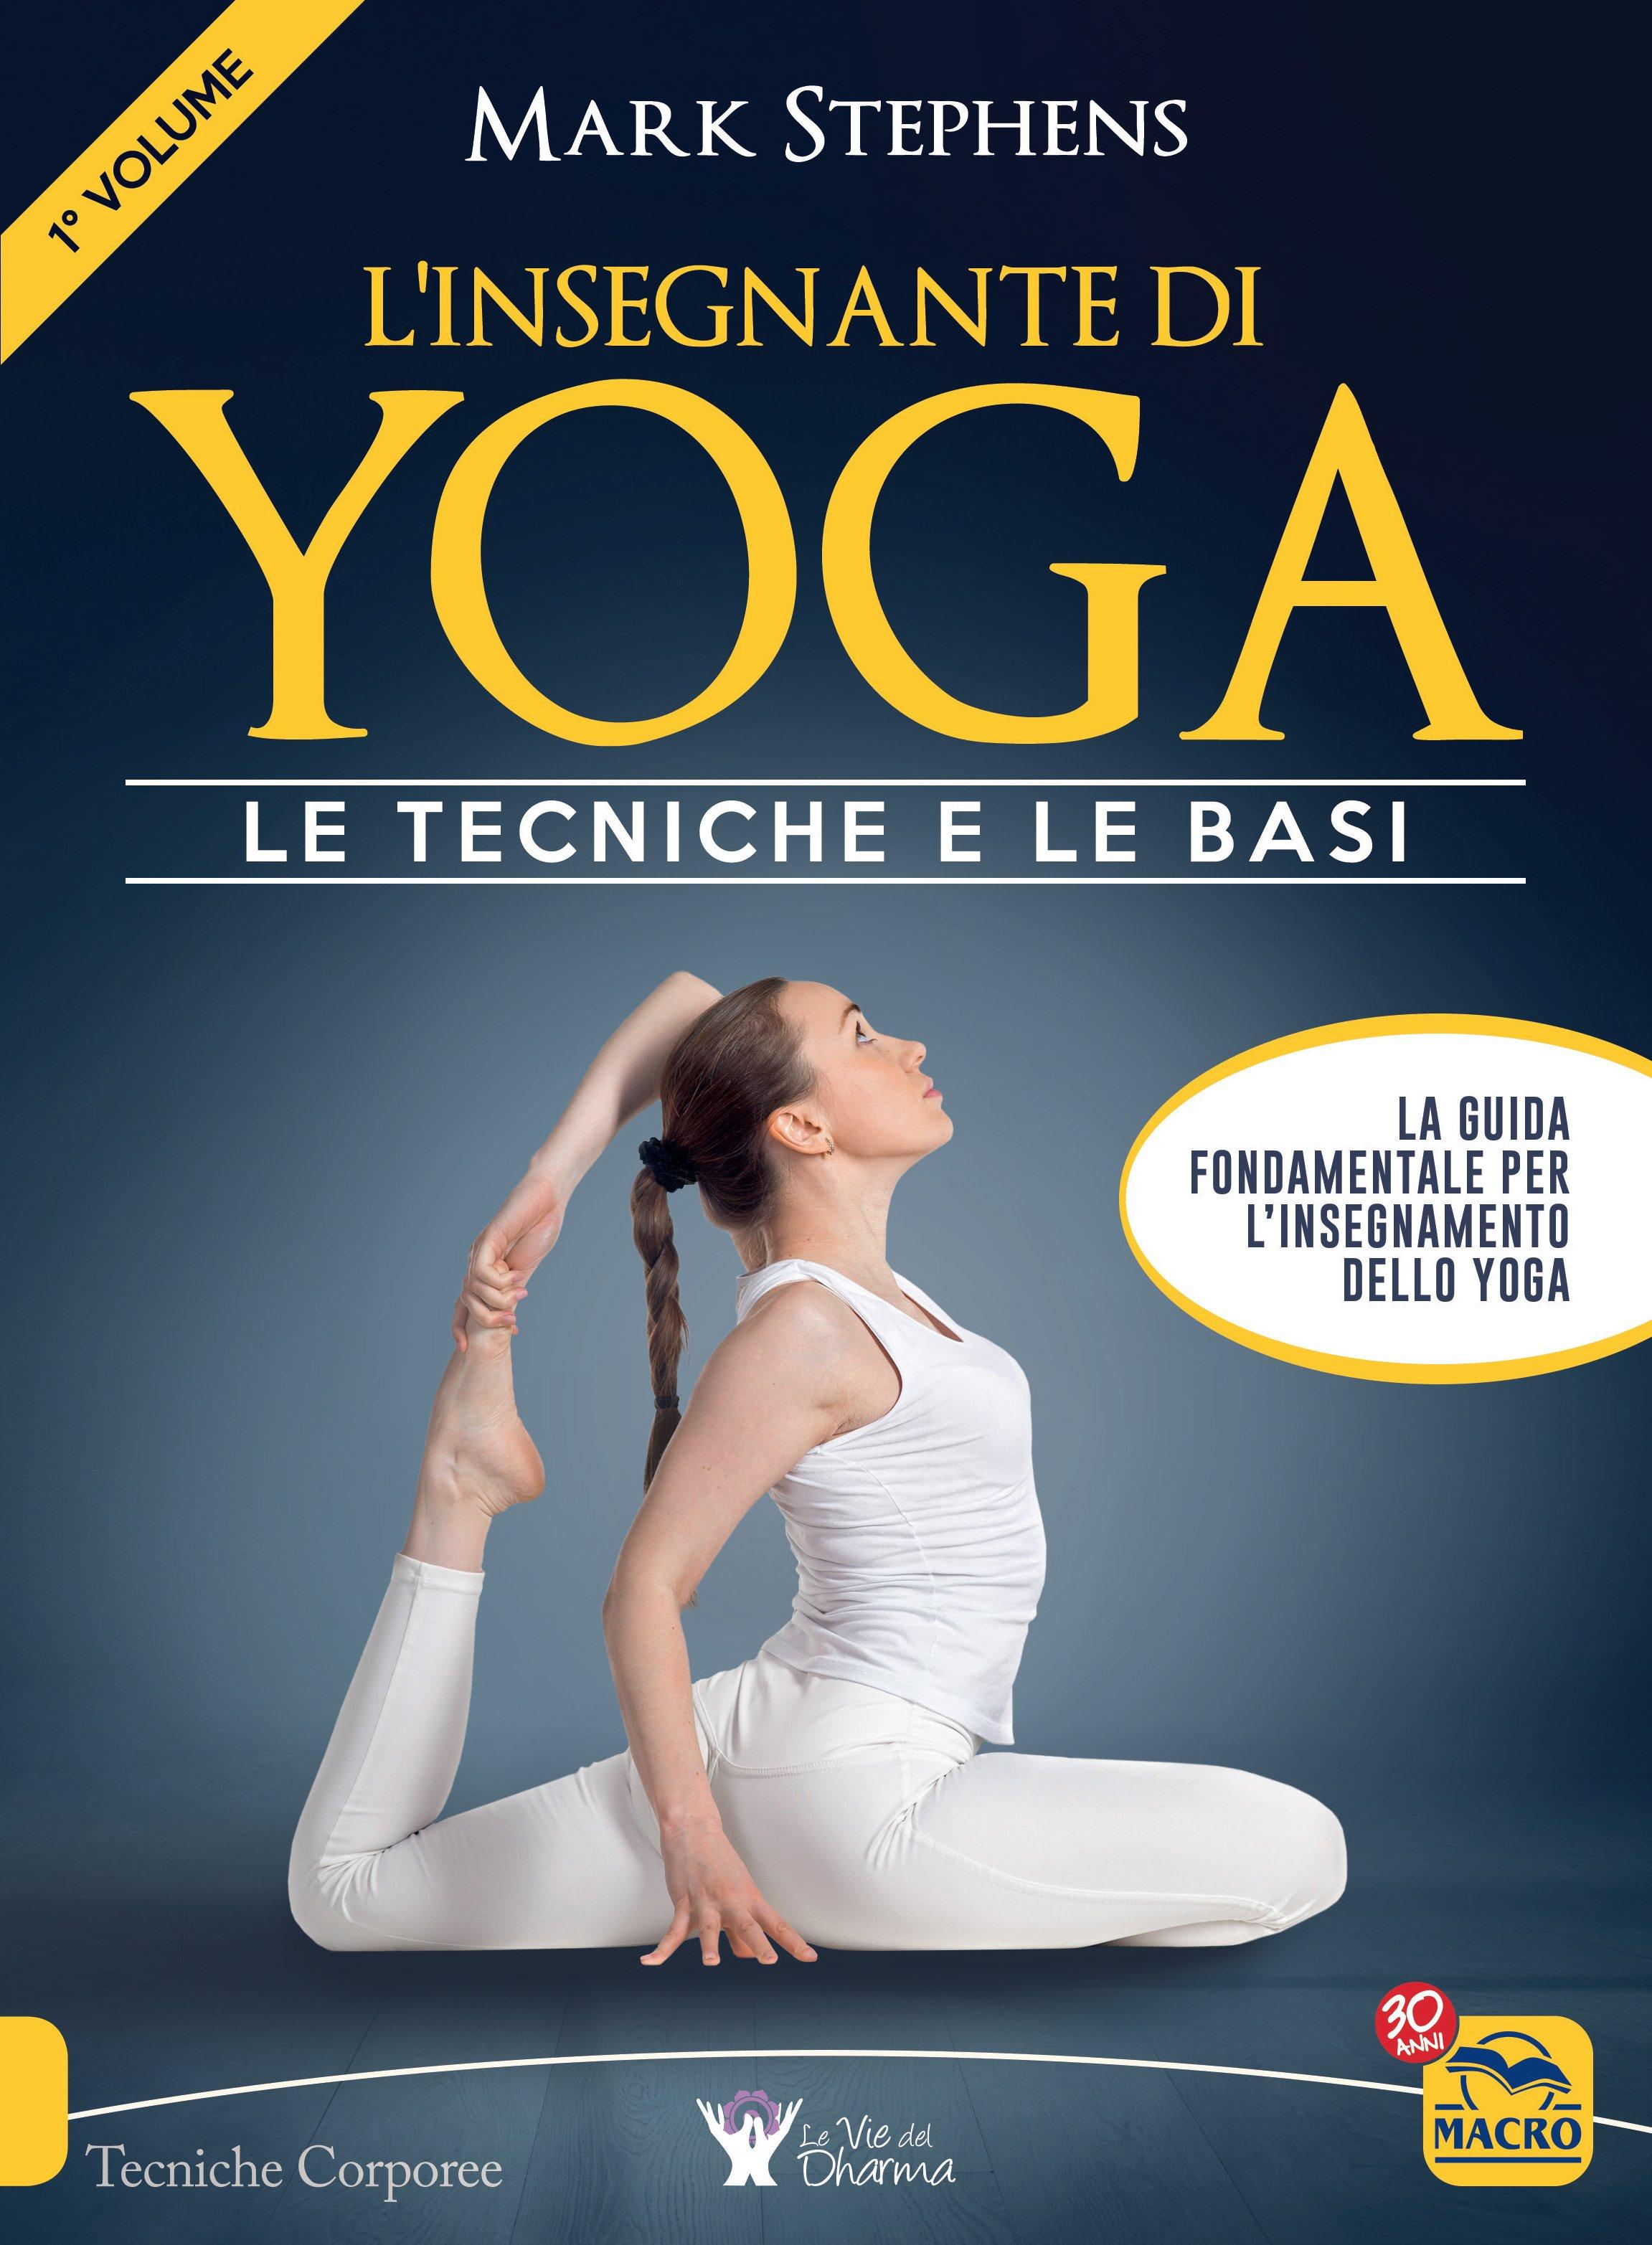 Linsegnante Di Yoga 1 Volume Ebook Pdf Di Mark Stephens